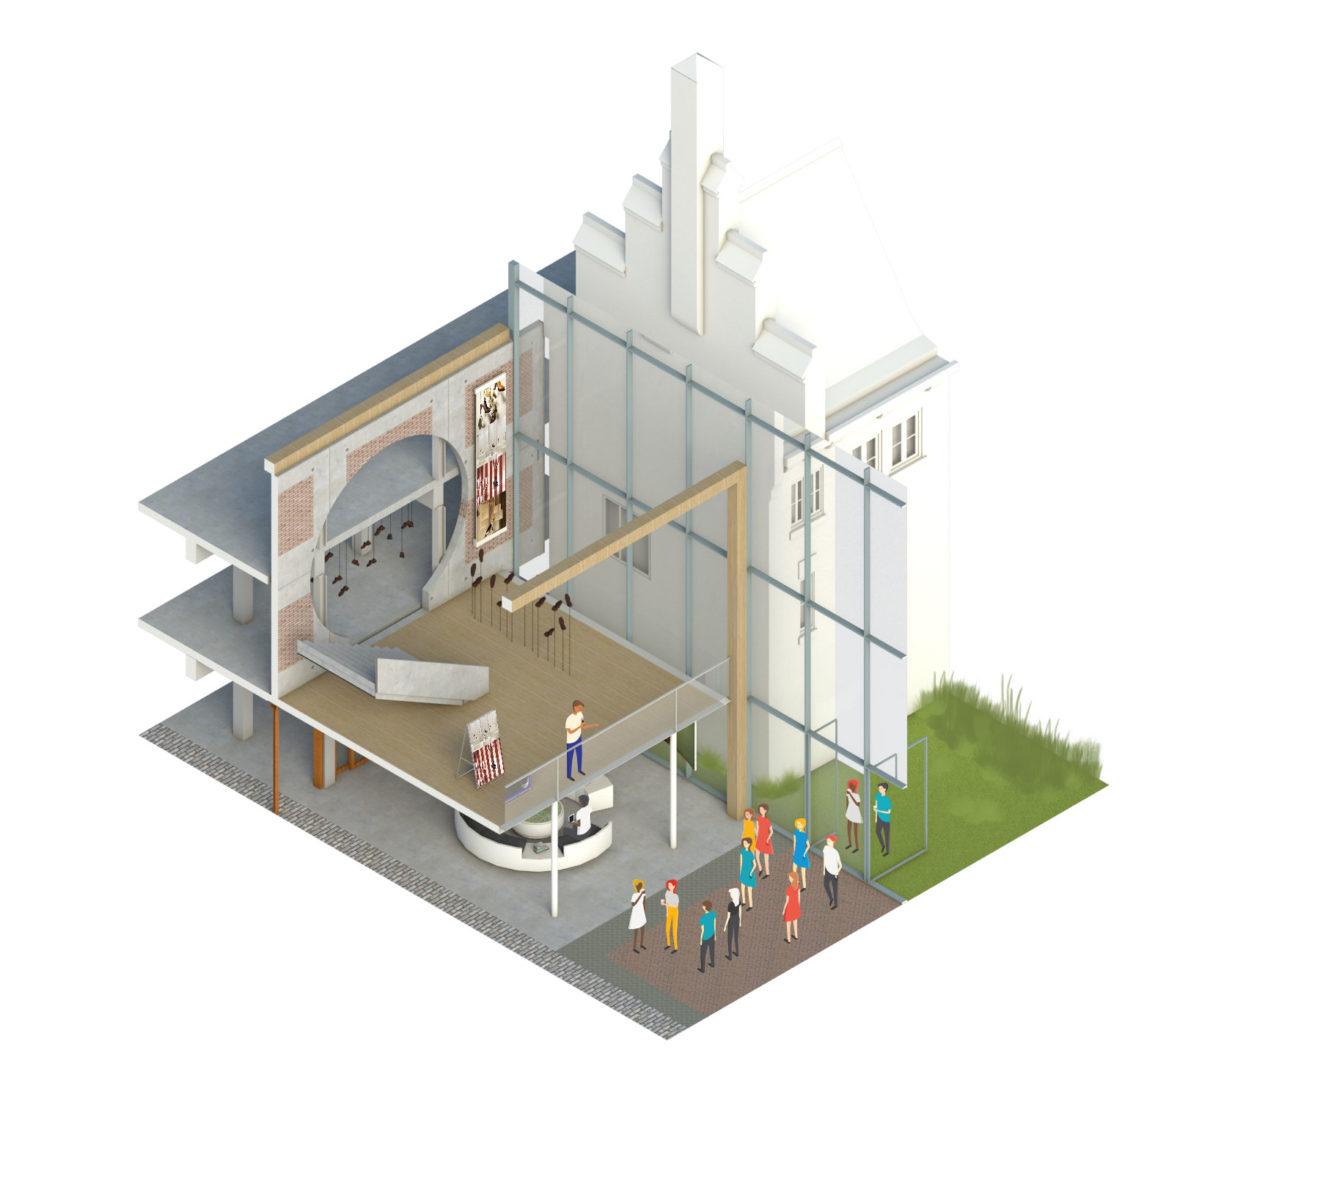 05b-Civic-Architects-Schoenenmuseum-Waalwijk-Interieur-Copyright-Civic-Architects